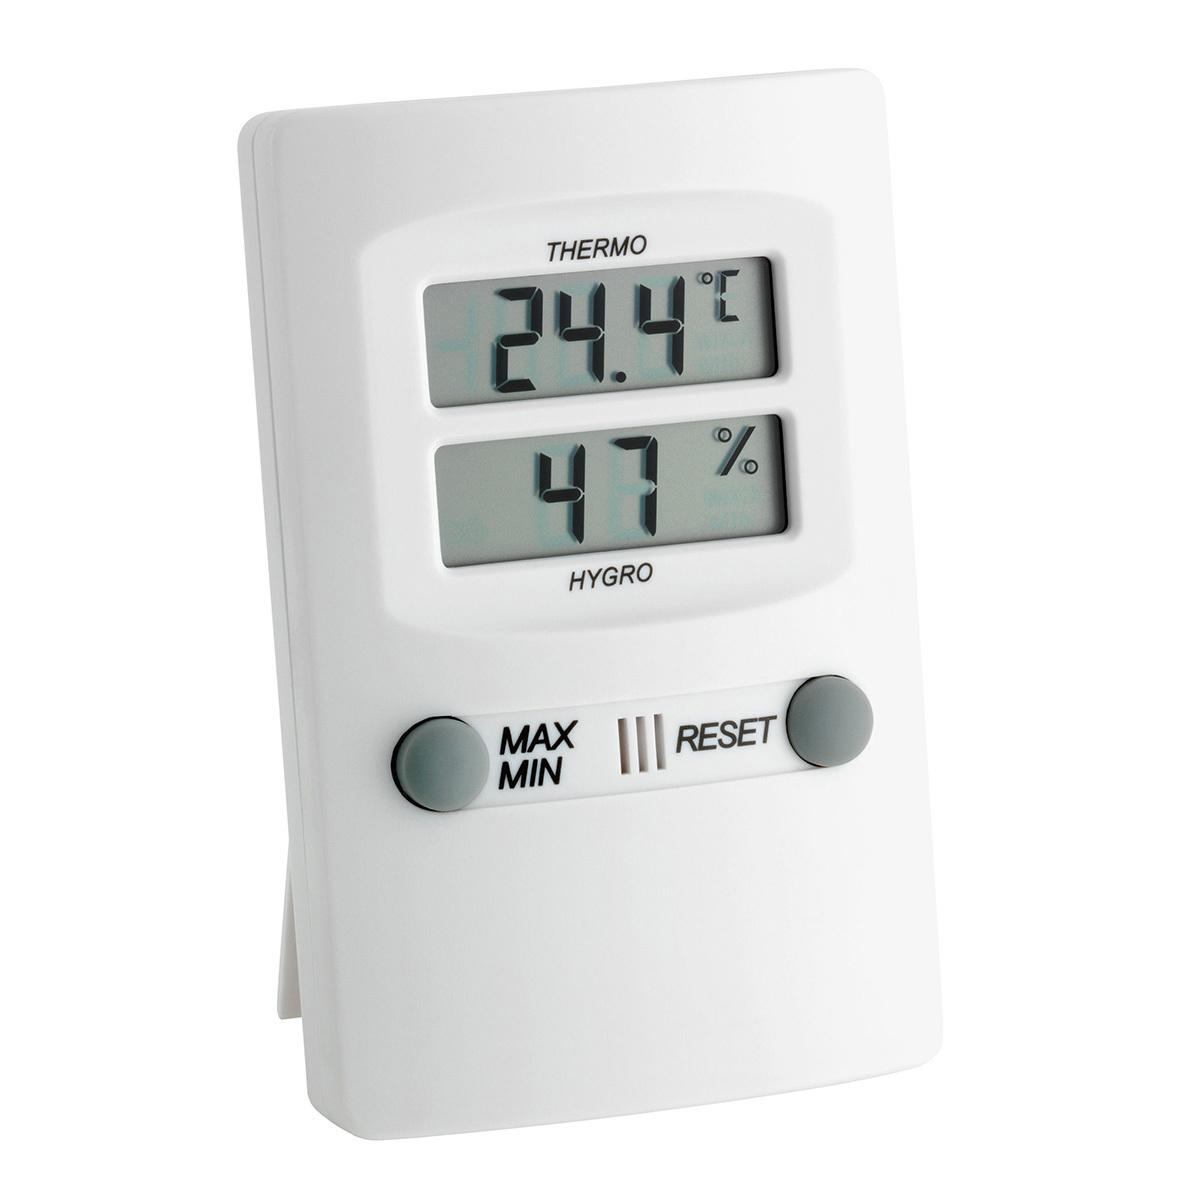 30-5000-02-digitales-thermo-hygrometer-1200x1200px.jpg